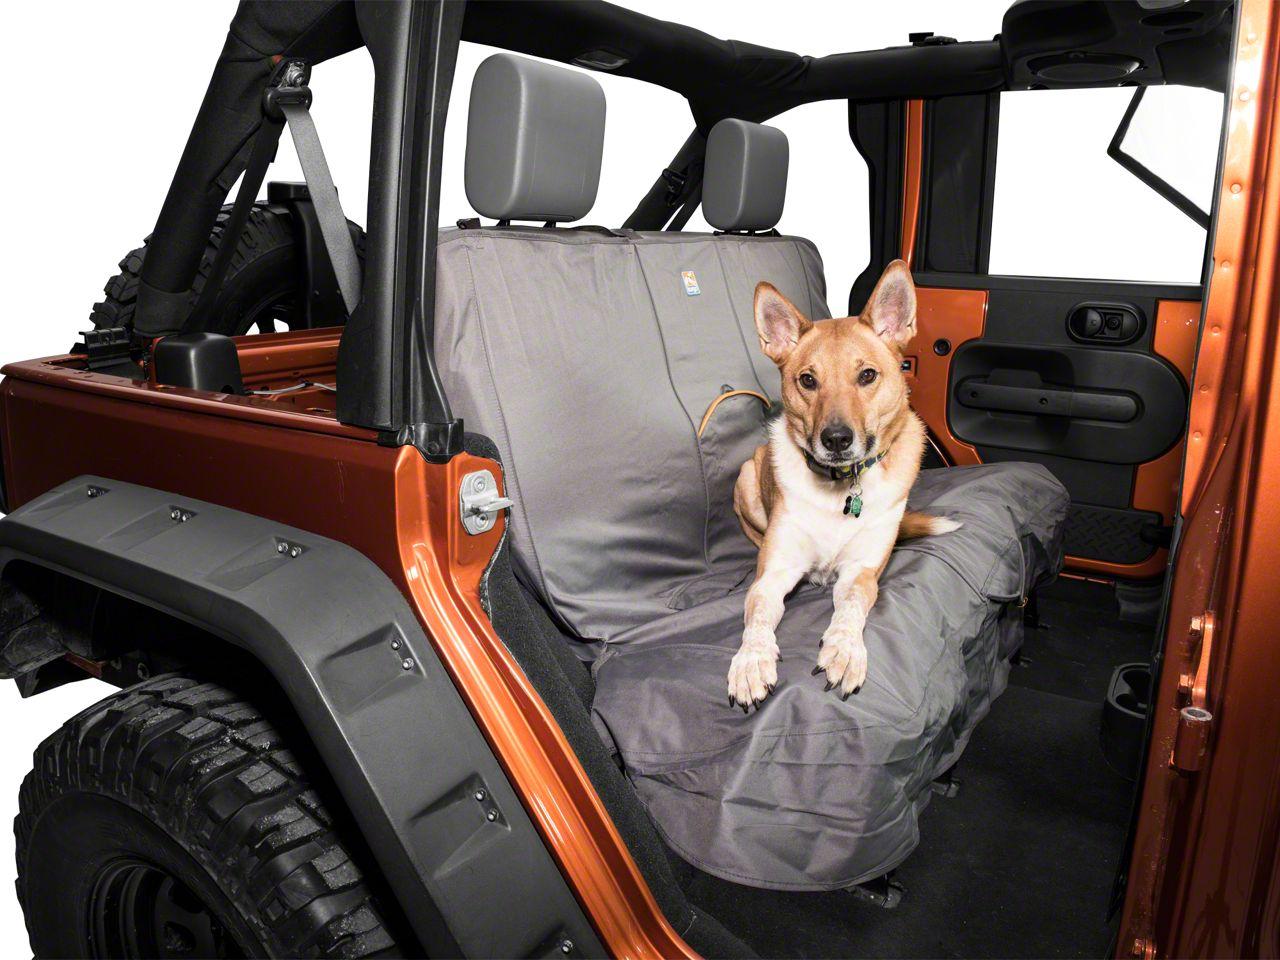 Kurgo Wander Rear Bench Seat Cover - Charcoal (87-19 Jeep Wrangler YJ, TJ, JK & JL)